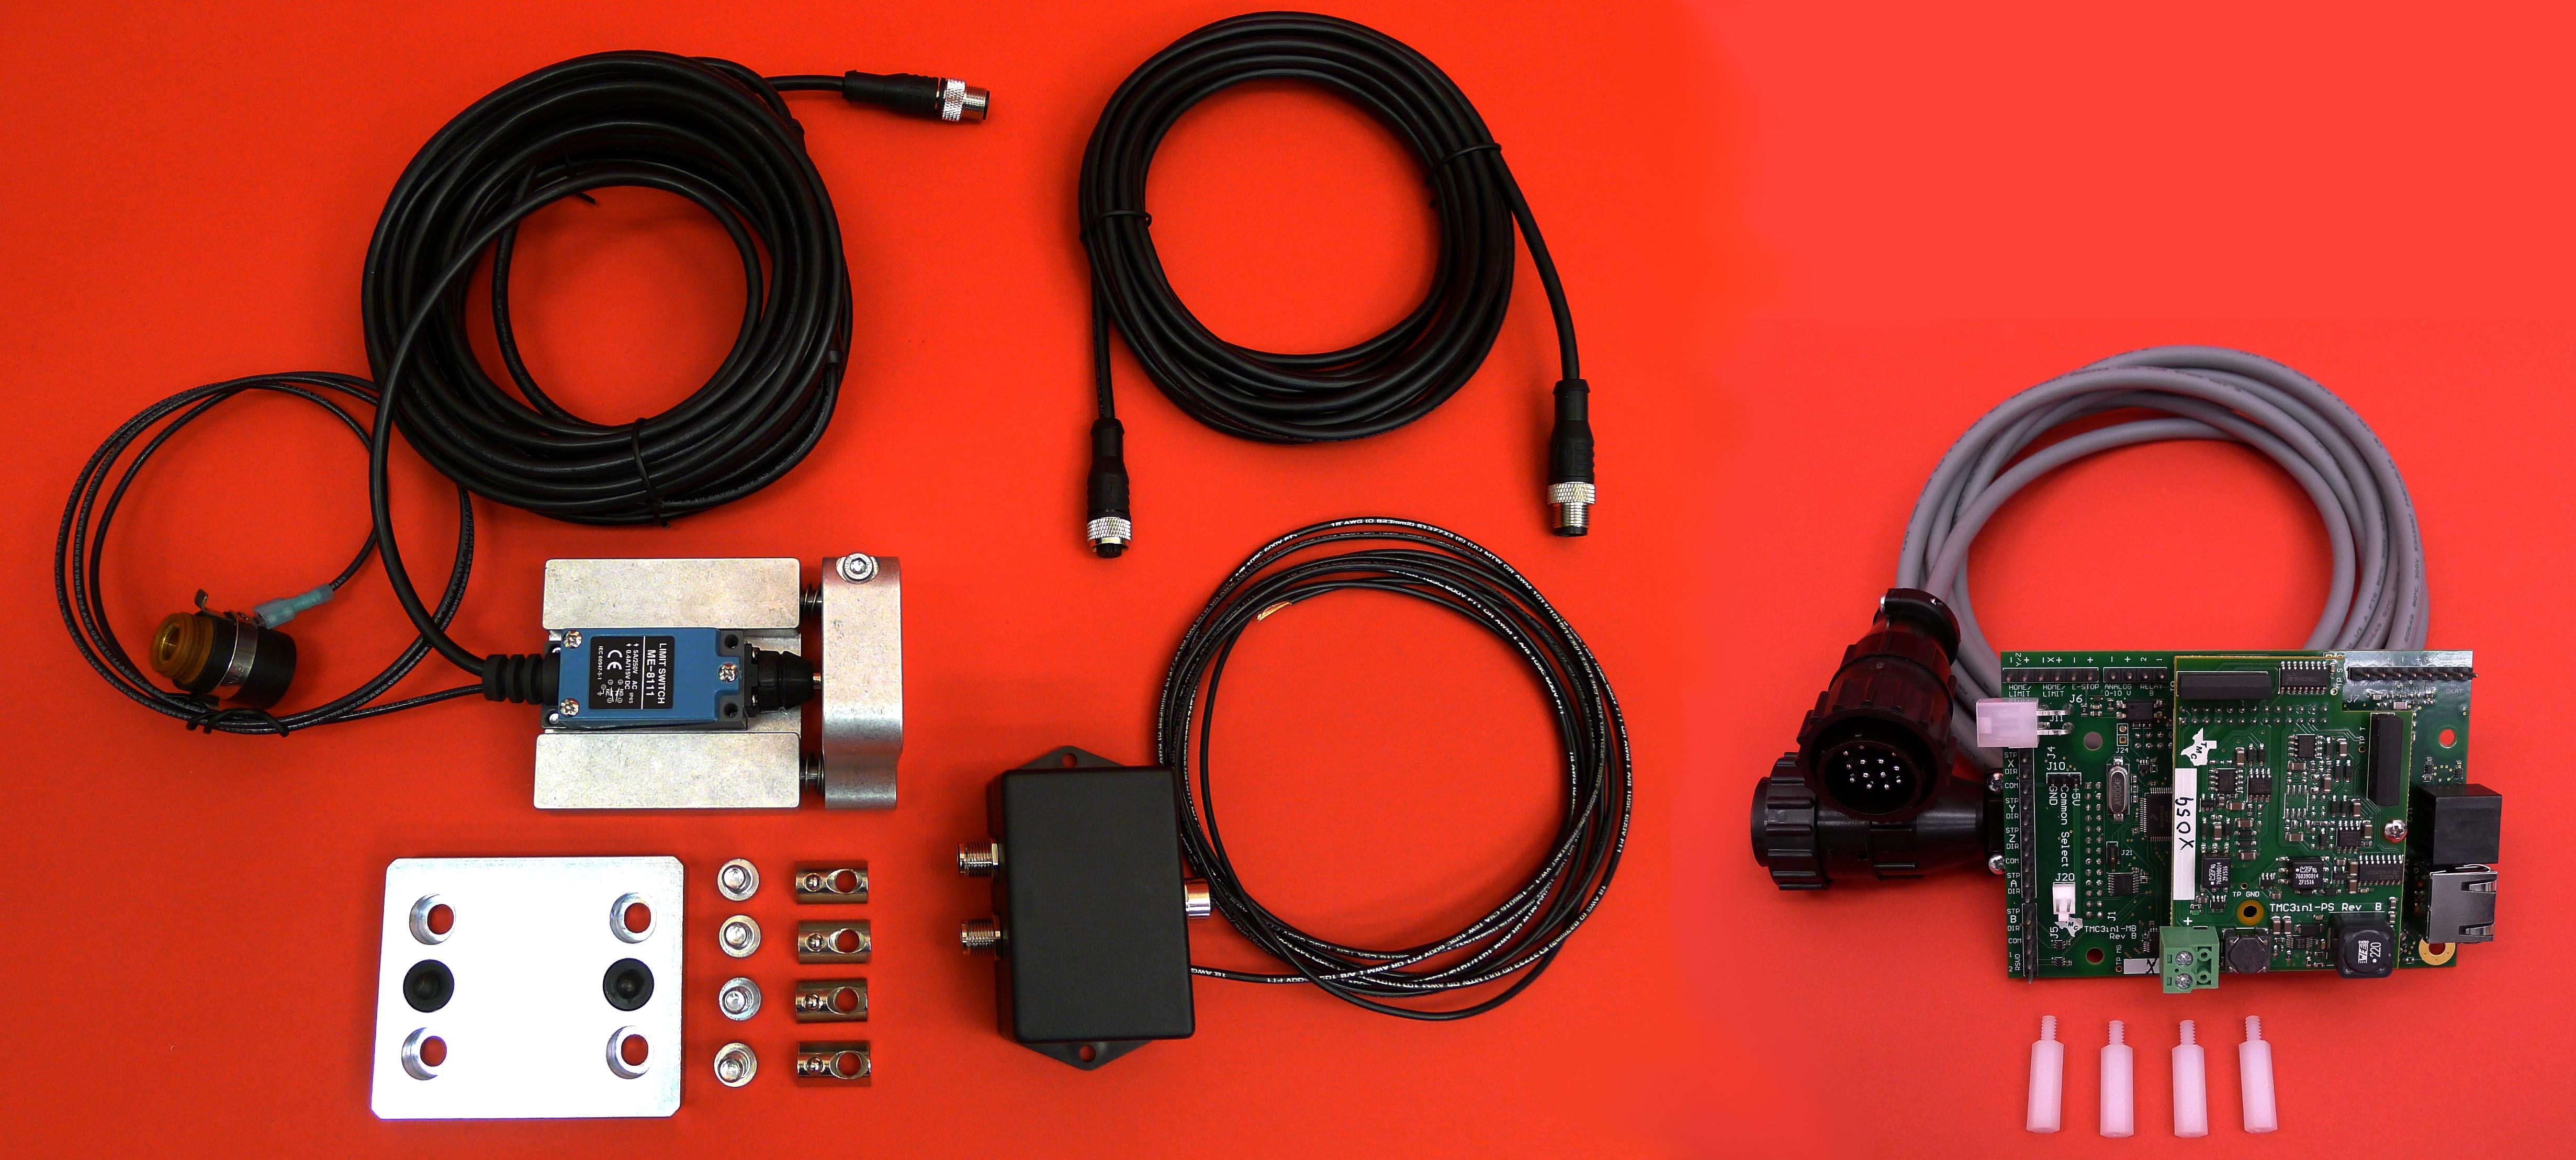 Pro Cnc Plasma Kit Cncrouterparts Hobby Circuit Kits Click To Enlarge